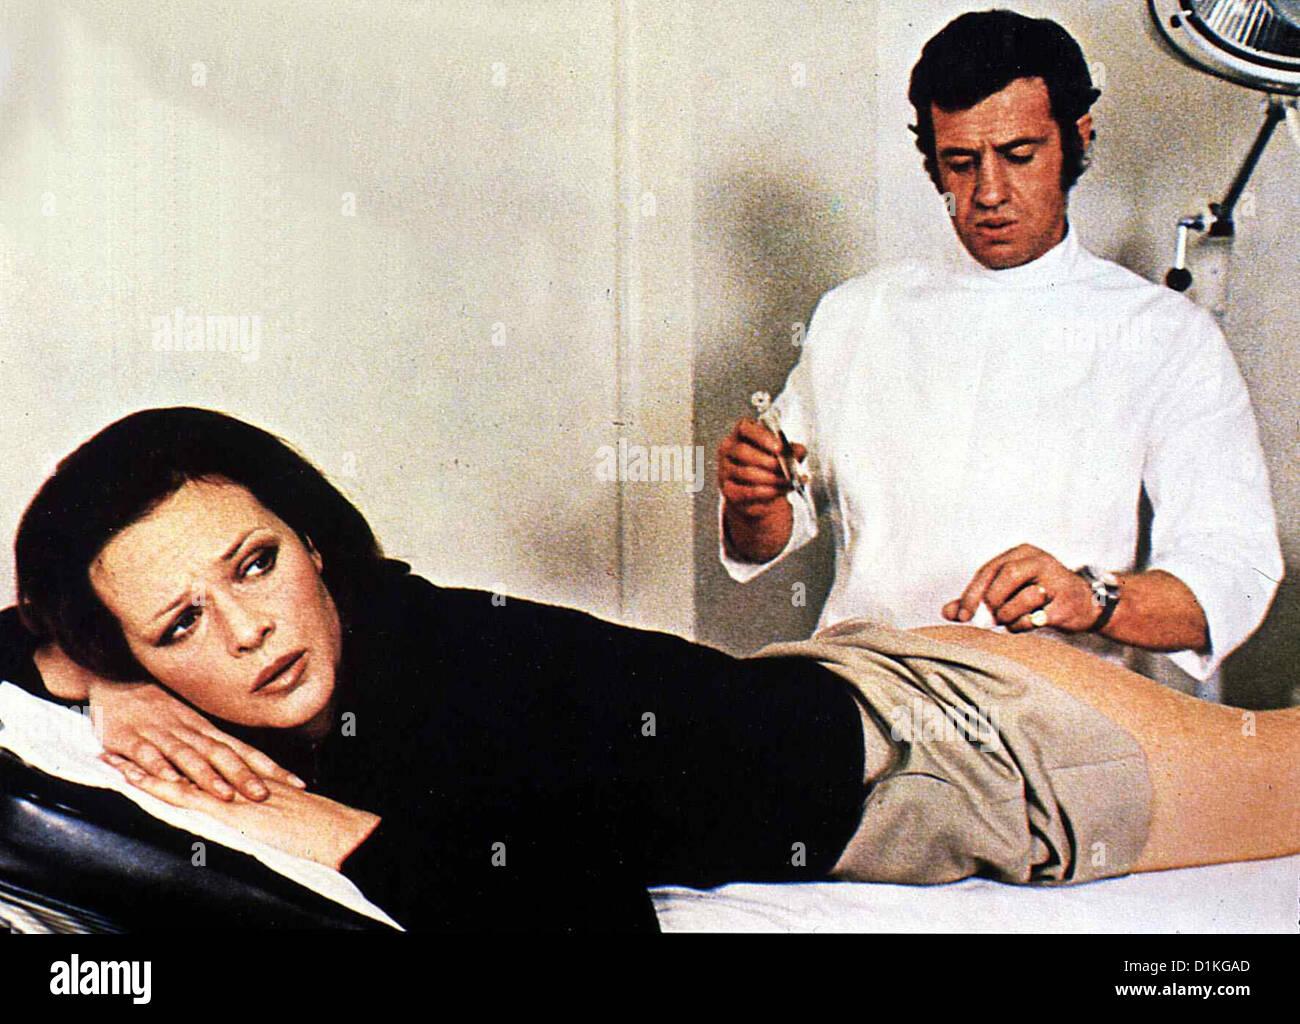 doktor popaul docteur popaul laura antonelli jean paul belmondo stock photo 52675685 alamy. Black Bedroom Furniture Sets. Home Design Ideas